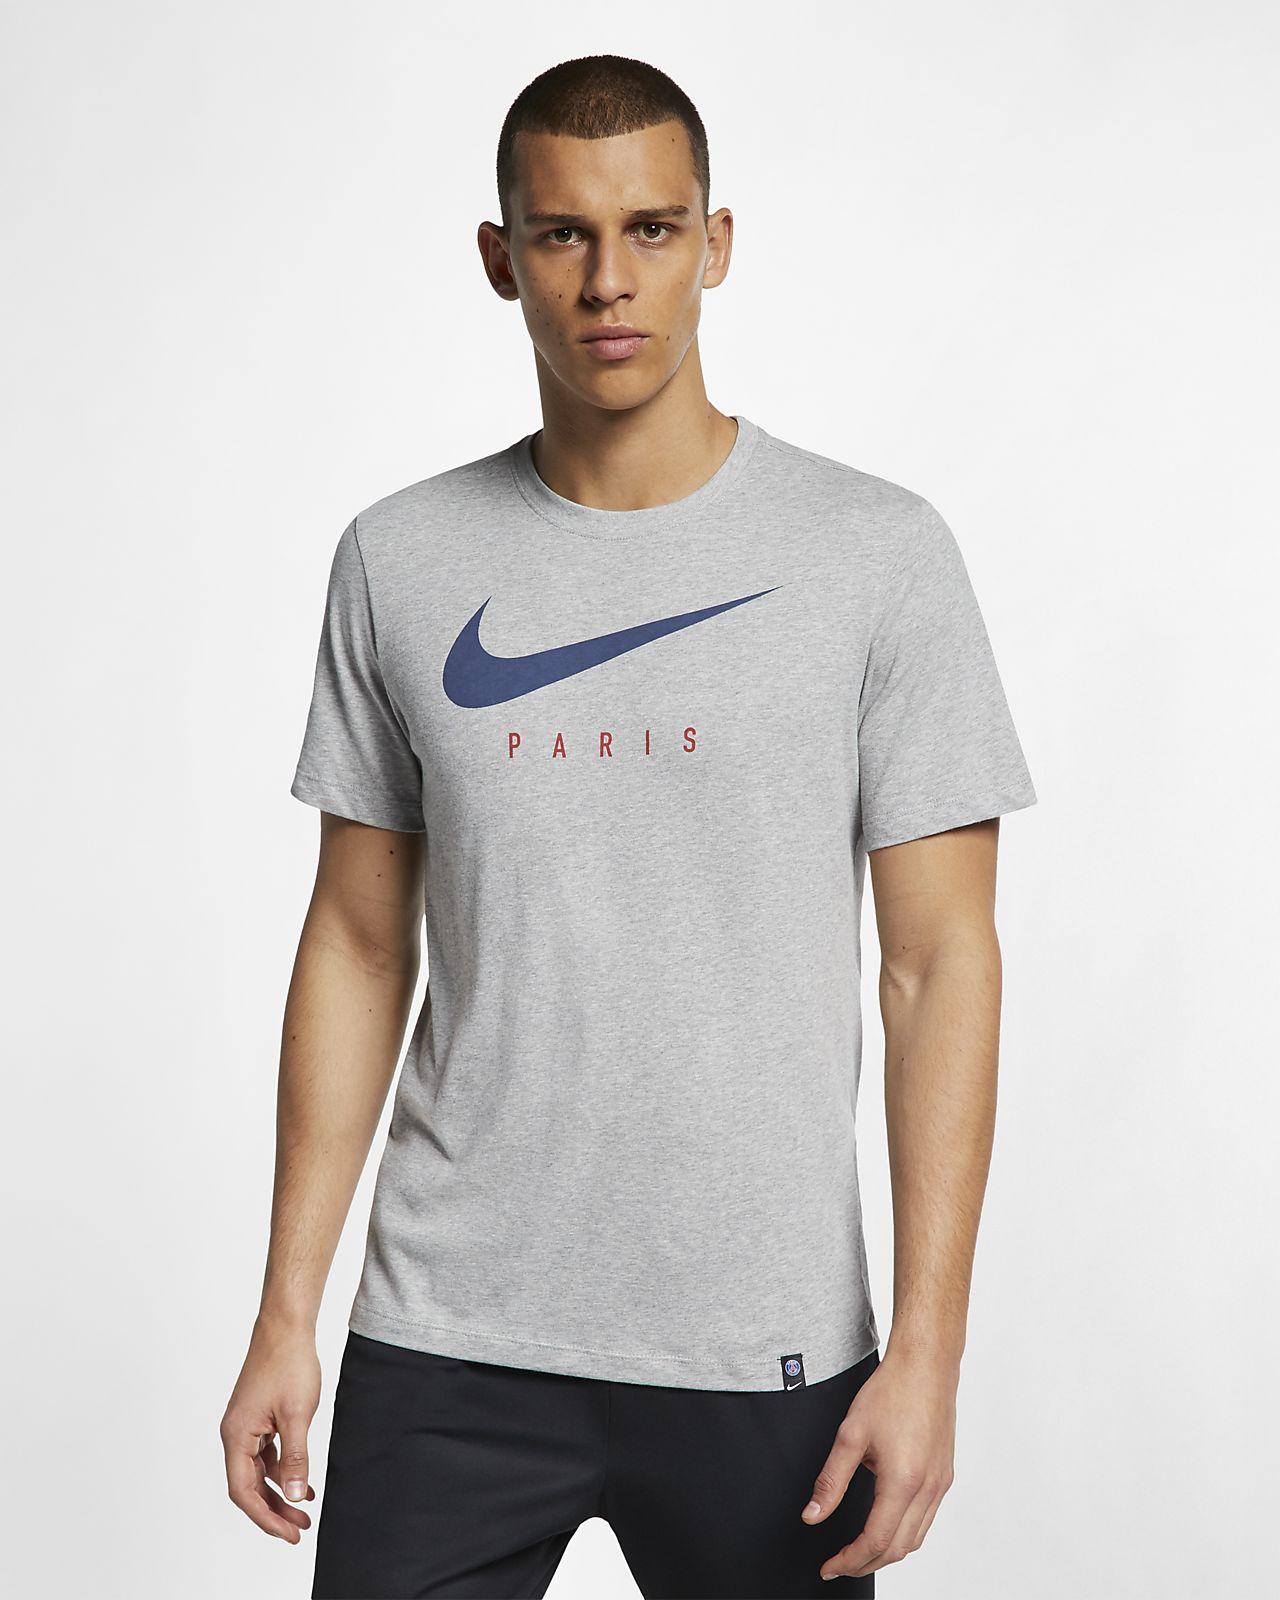 París Saint-Germain Camiseta de fútbol - Hombre